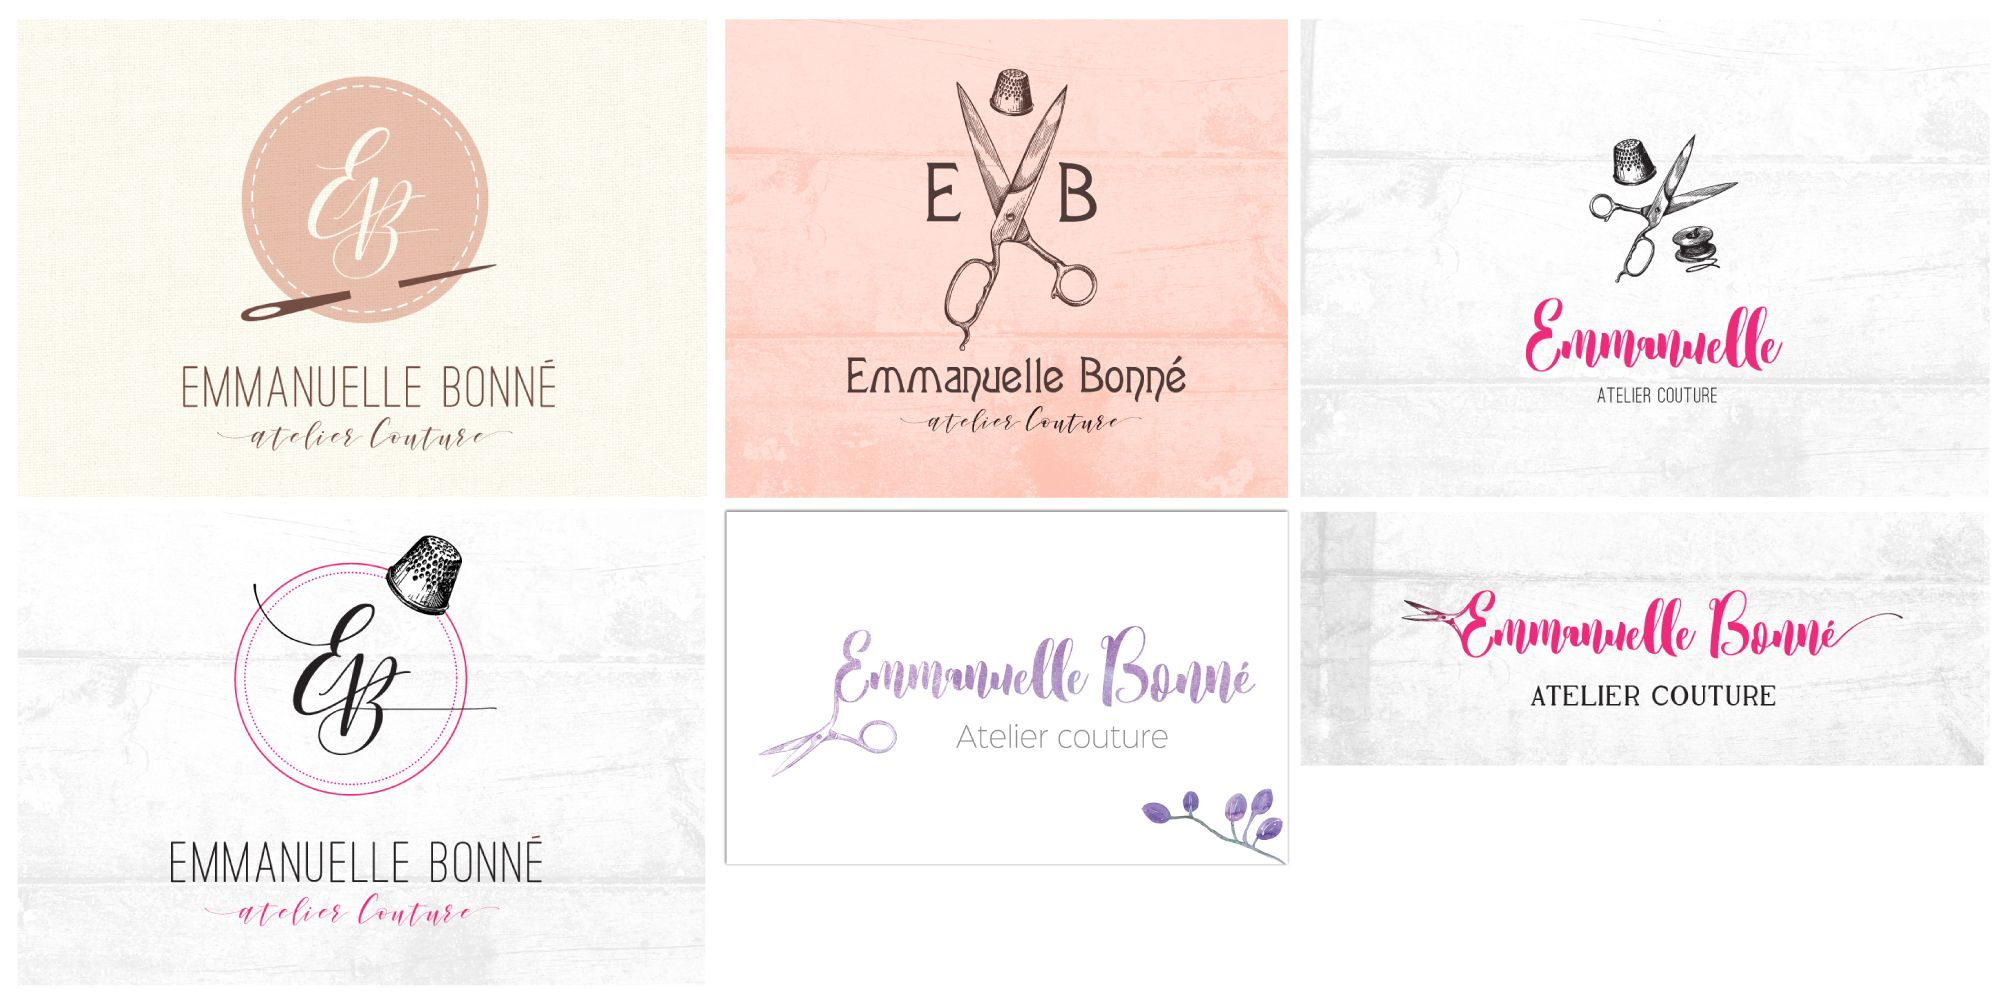 Recherche De Logo Couture Identite Visuelle Branding Graphisme Logotype Carte